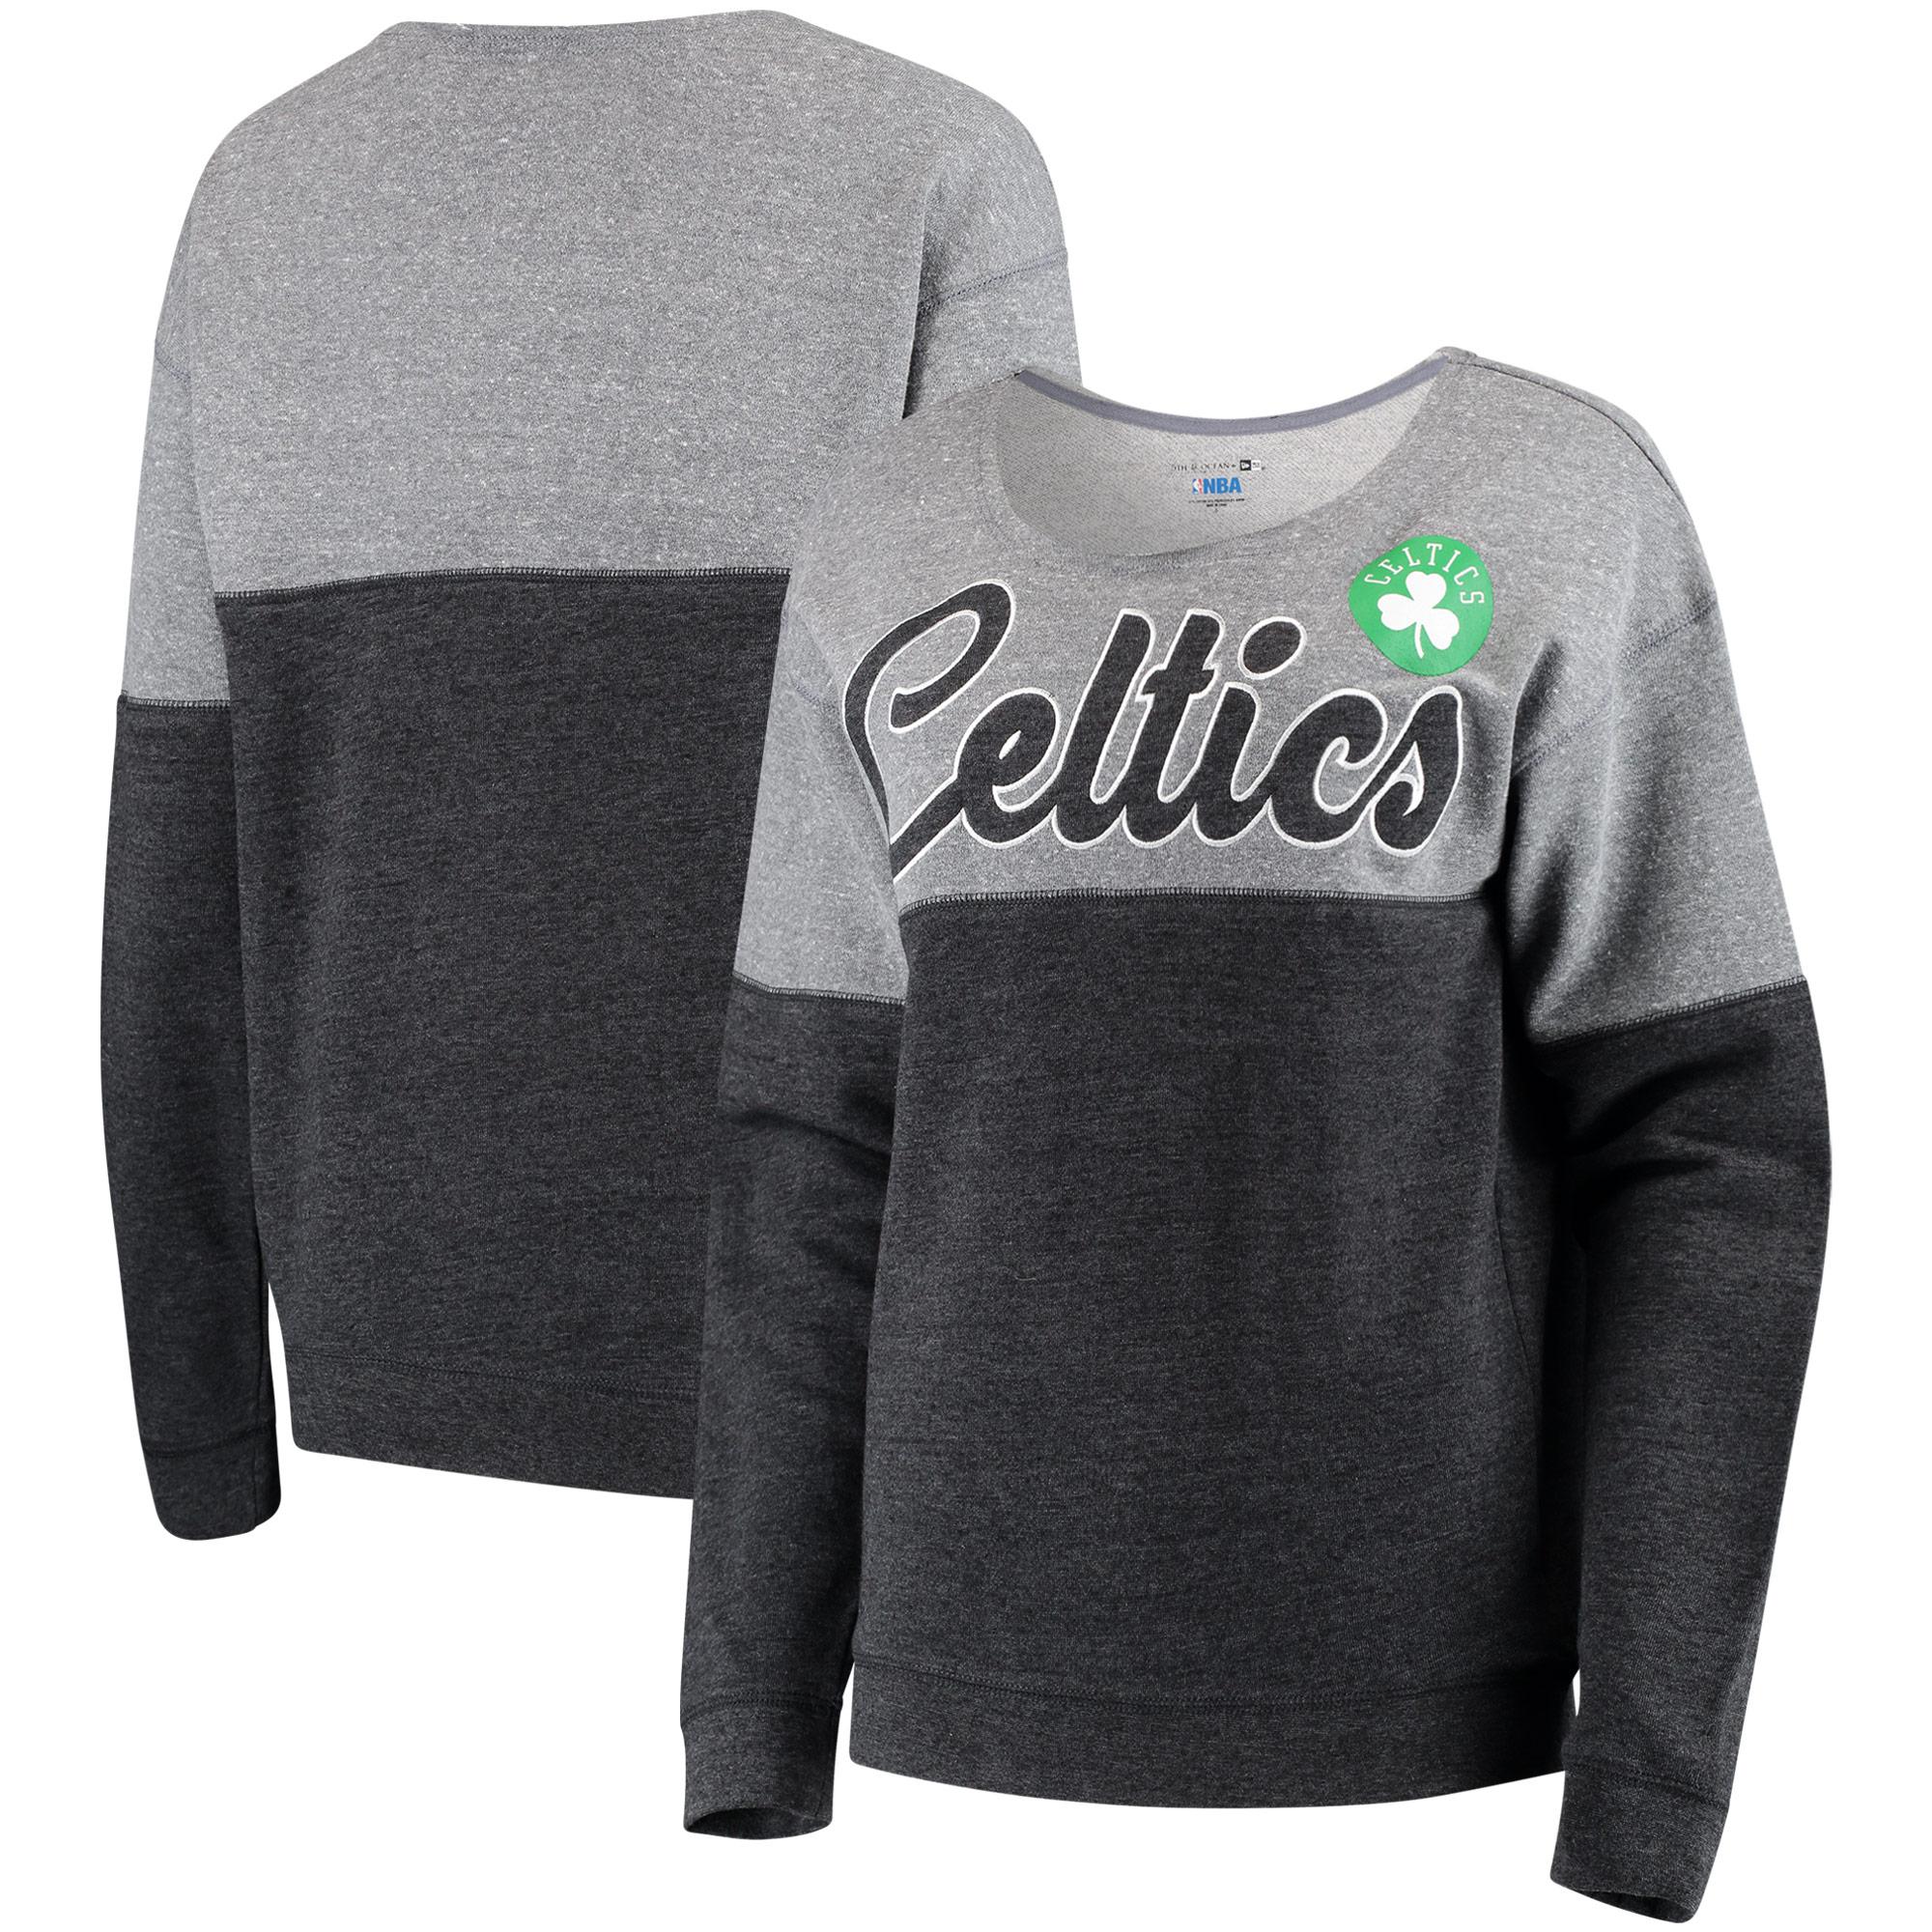 Boston Celtics New Era Women's Fleece Tri-Blend Scoop Neck Pullover Sweatshirt - Heathered Black/Heathered Gray